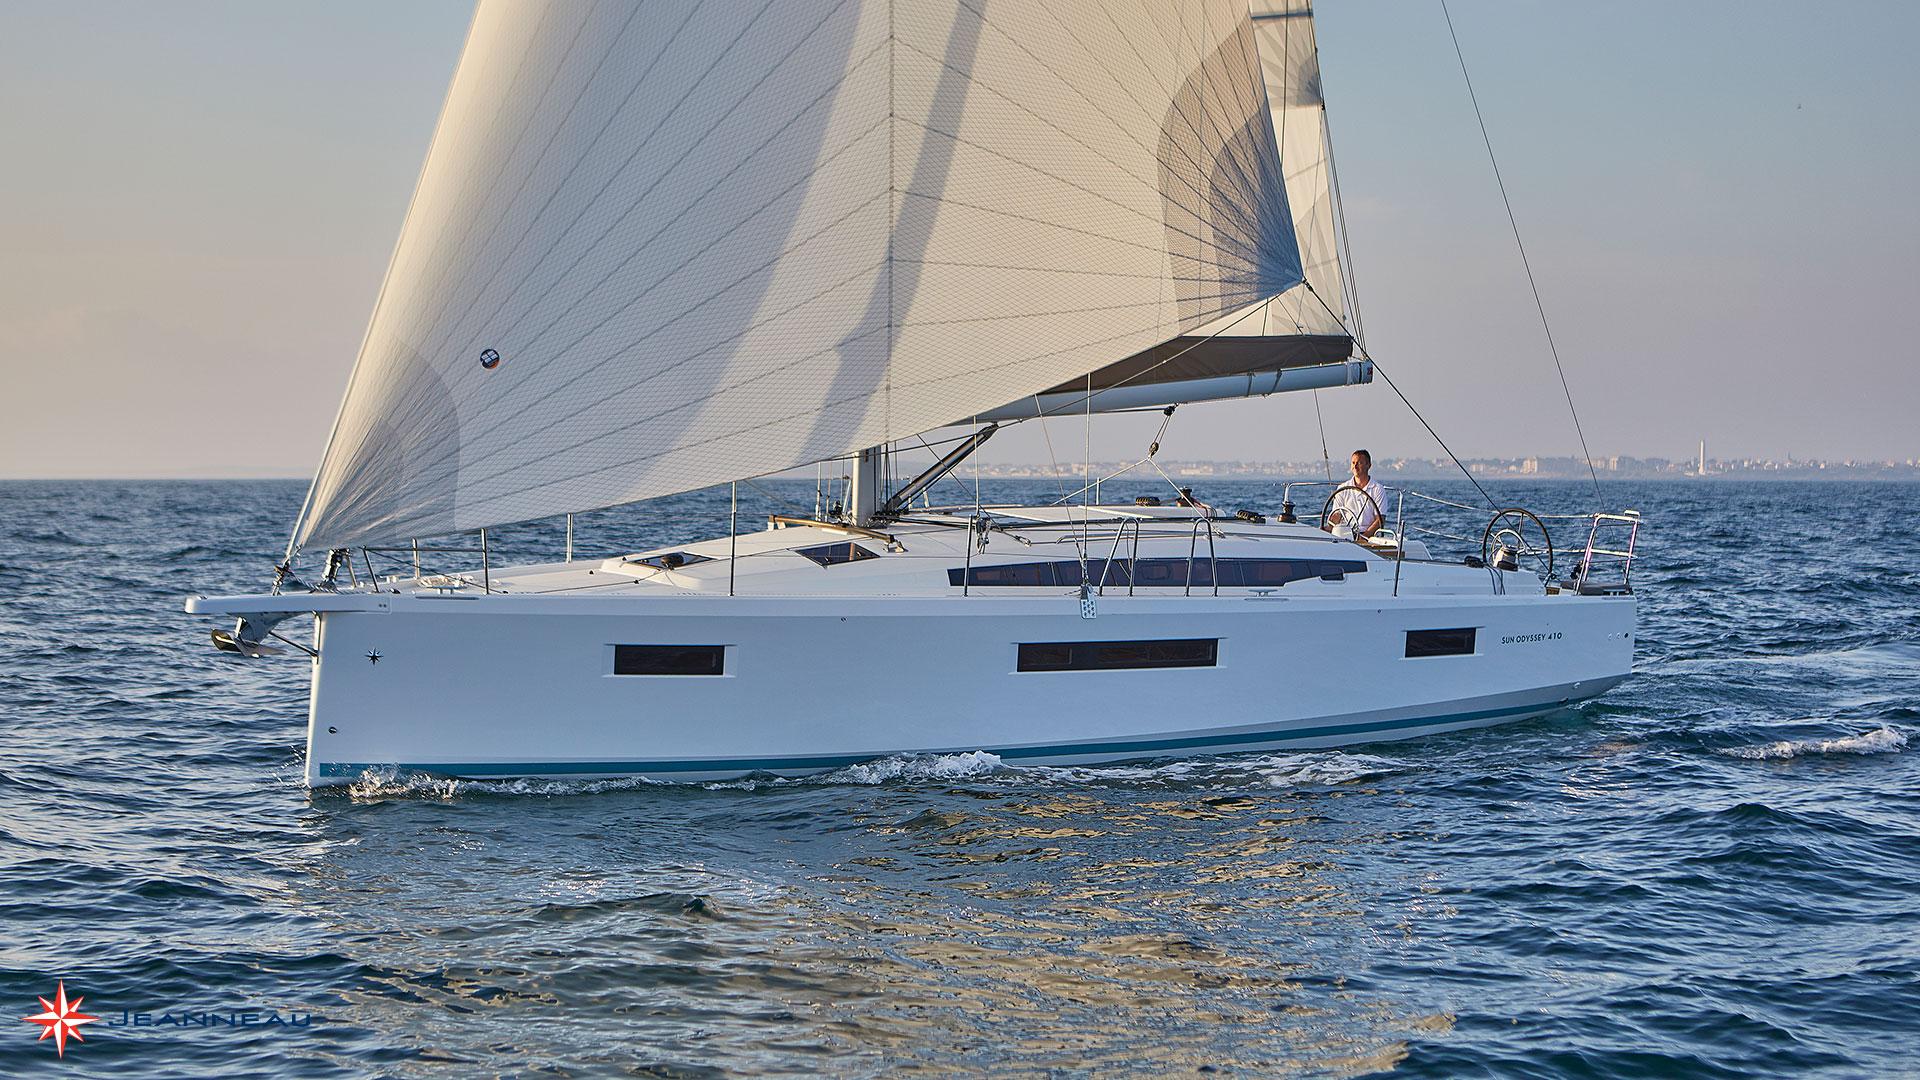 Jeanneau Sun Odyssey 410 38 South Boat Sales